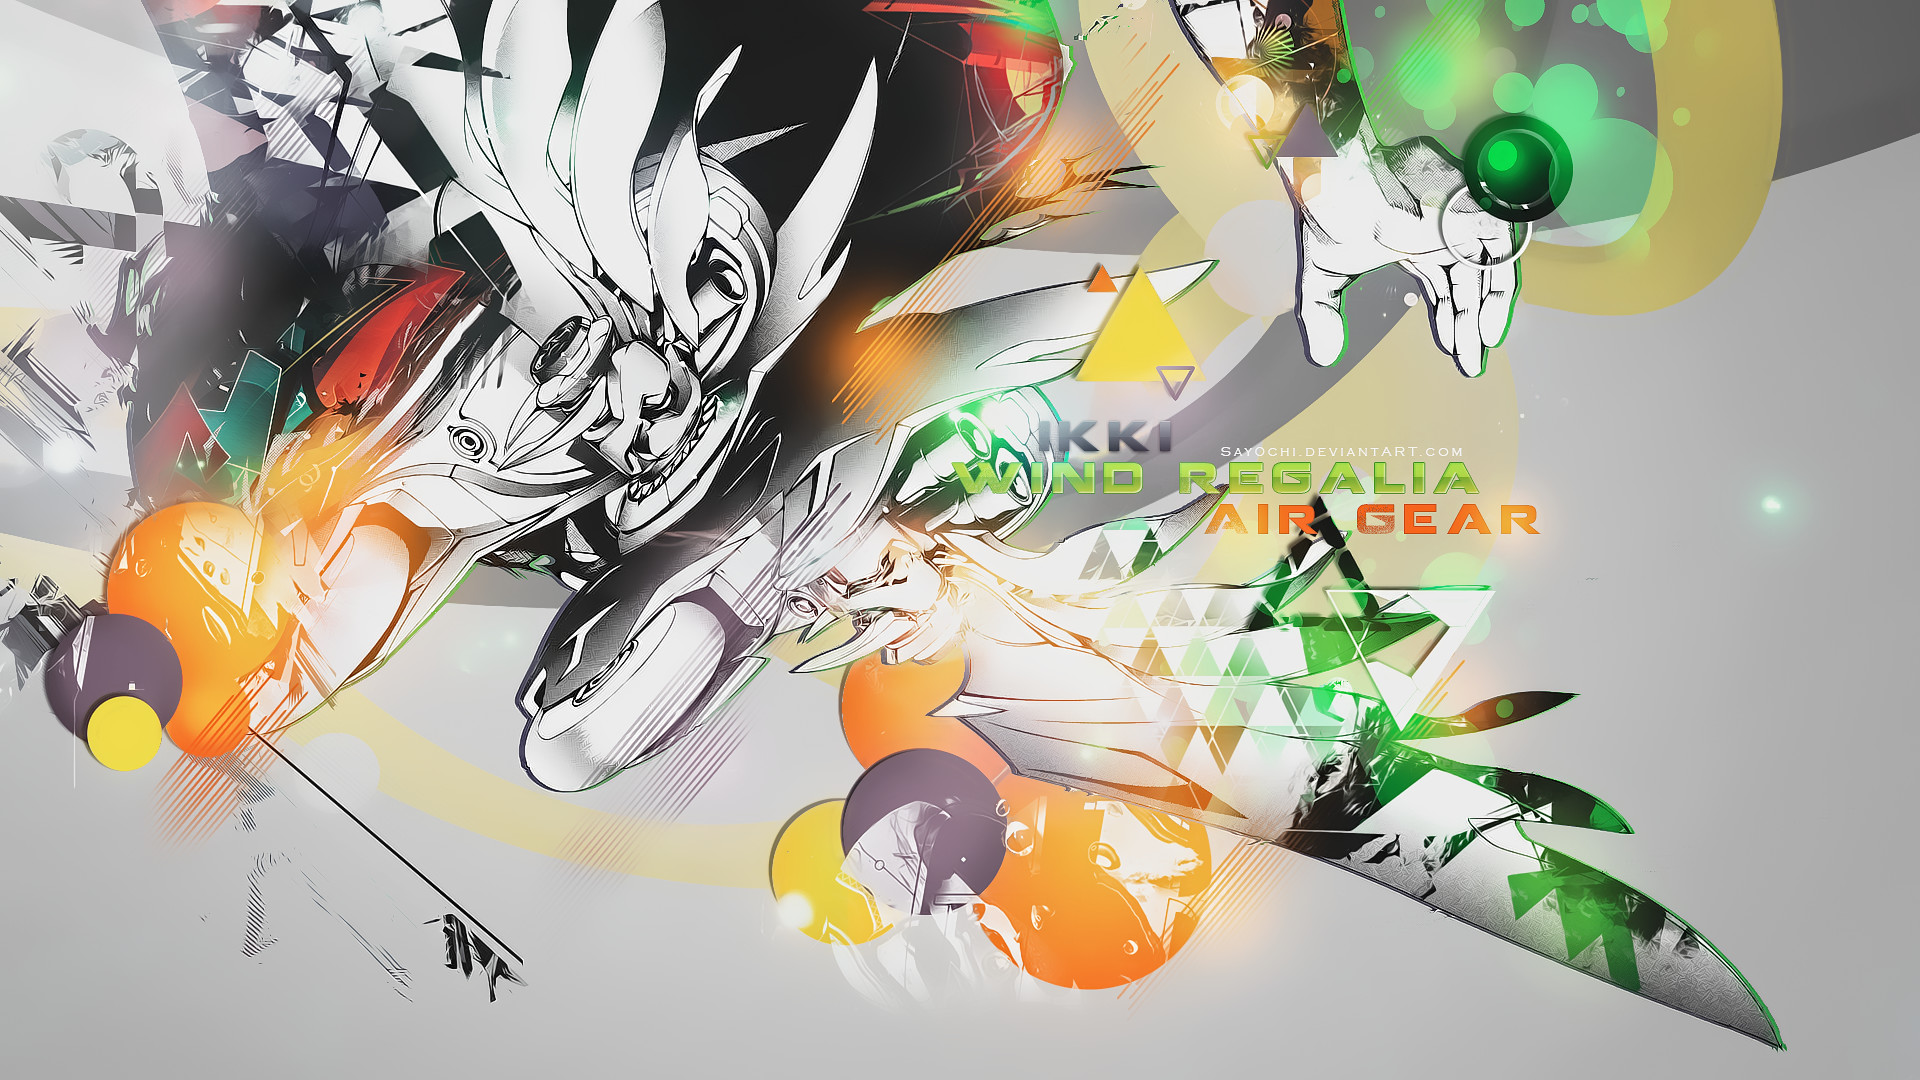 Res: 1920x1080, ... Air Gear Ikki - Wind Regalia Wallpaper [] by Say0chi